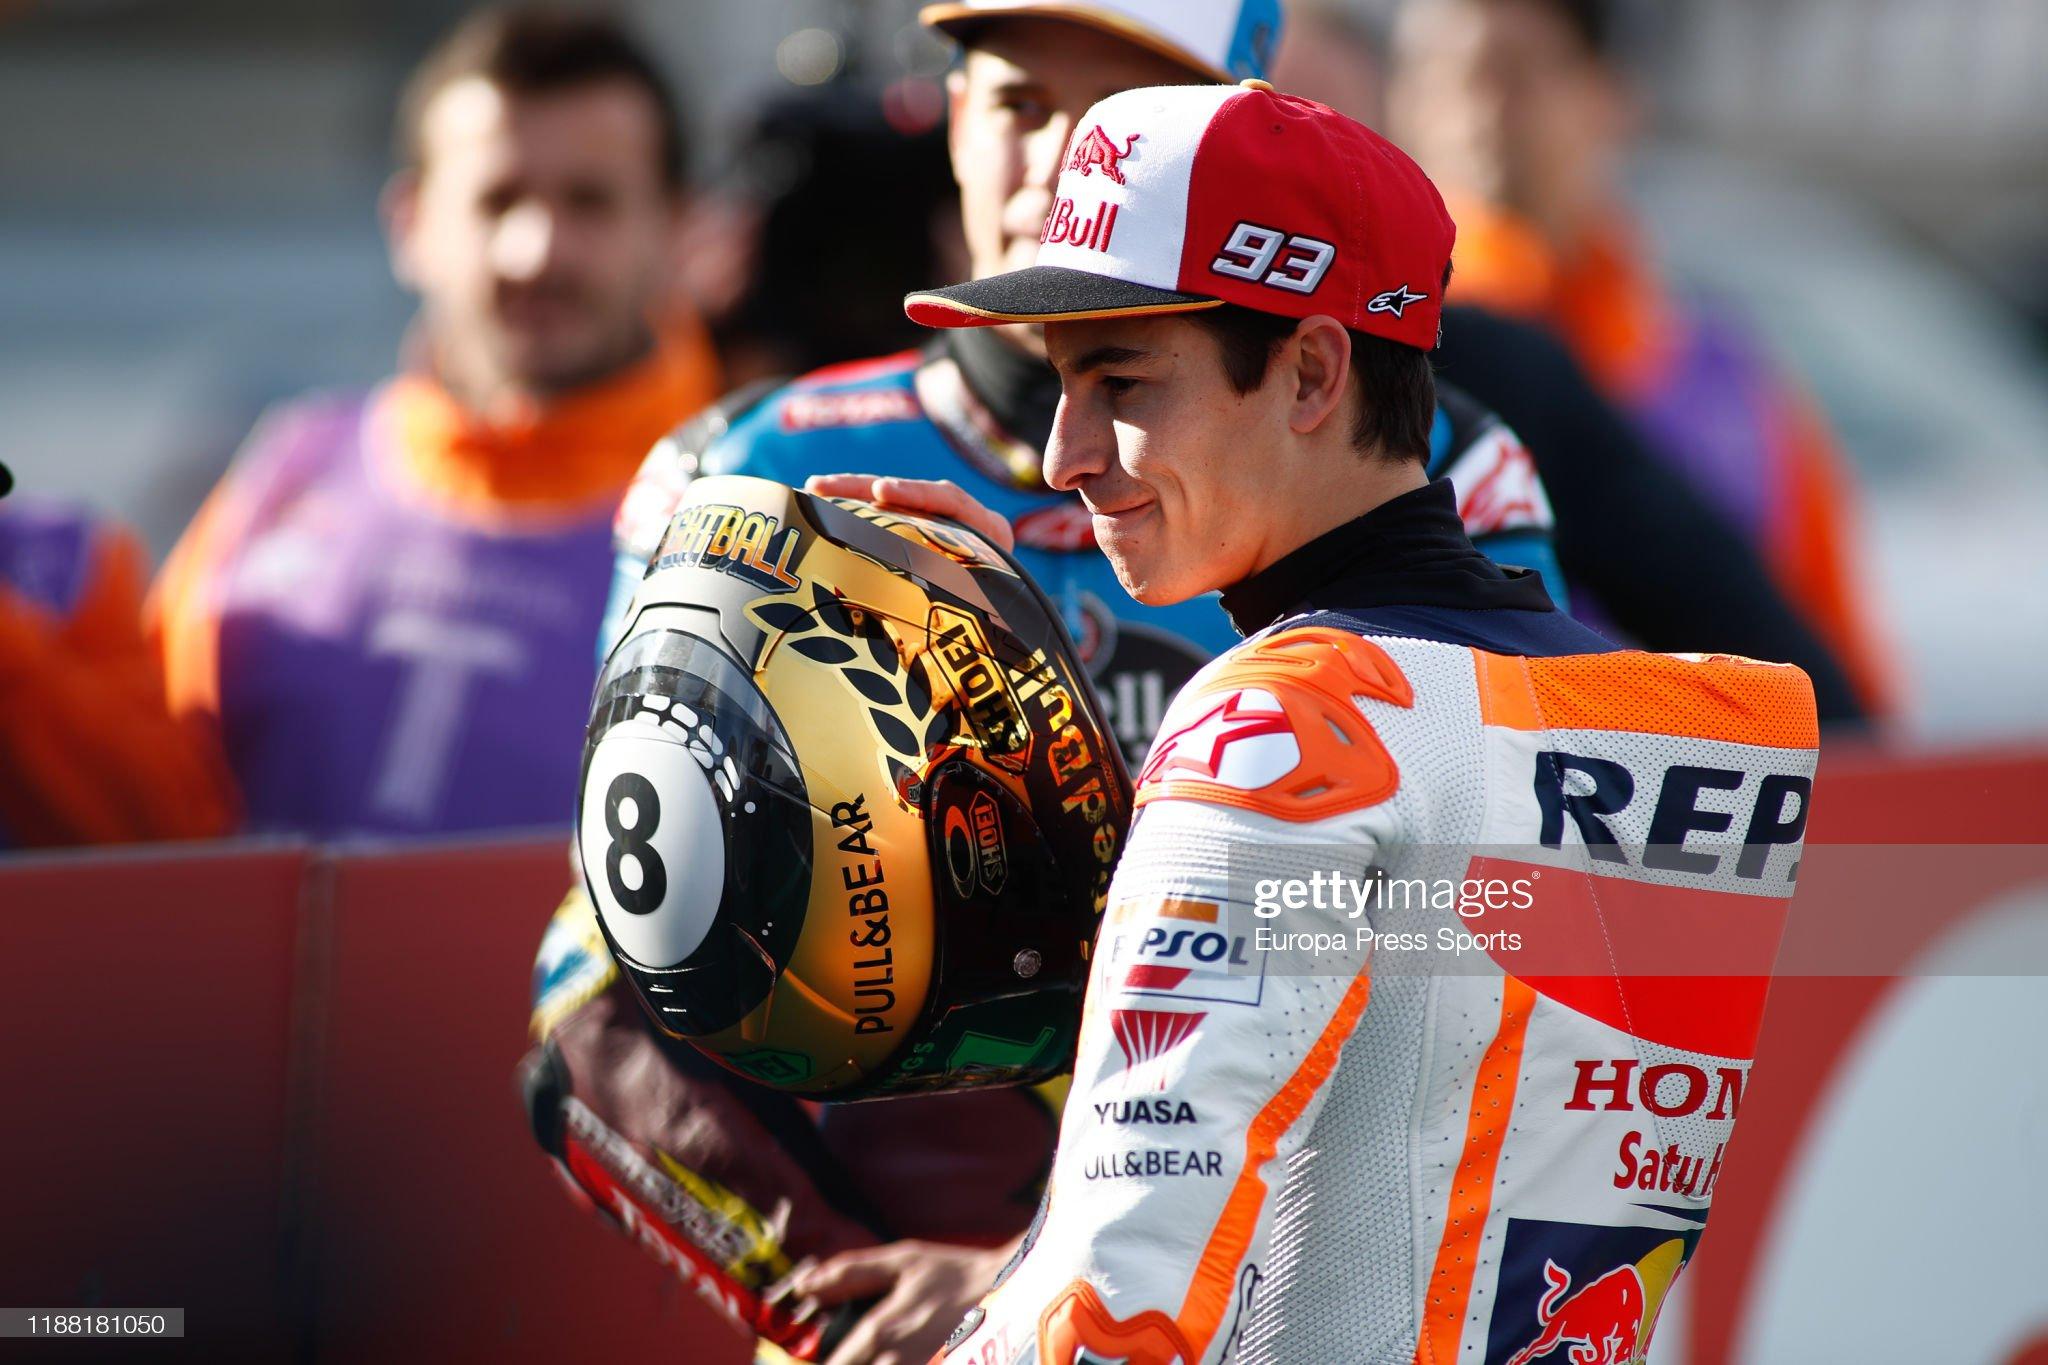 MOTOGP GRAND PRIX DE  VALENCE DU 15 AU 17 NOVEMBRE 2019 Marc-marquez-rider-of-repsol-honda-team-from-spain-looks-on-during-picture-id1188181050?s=2048x2048